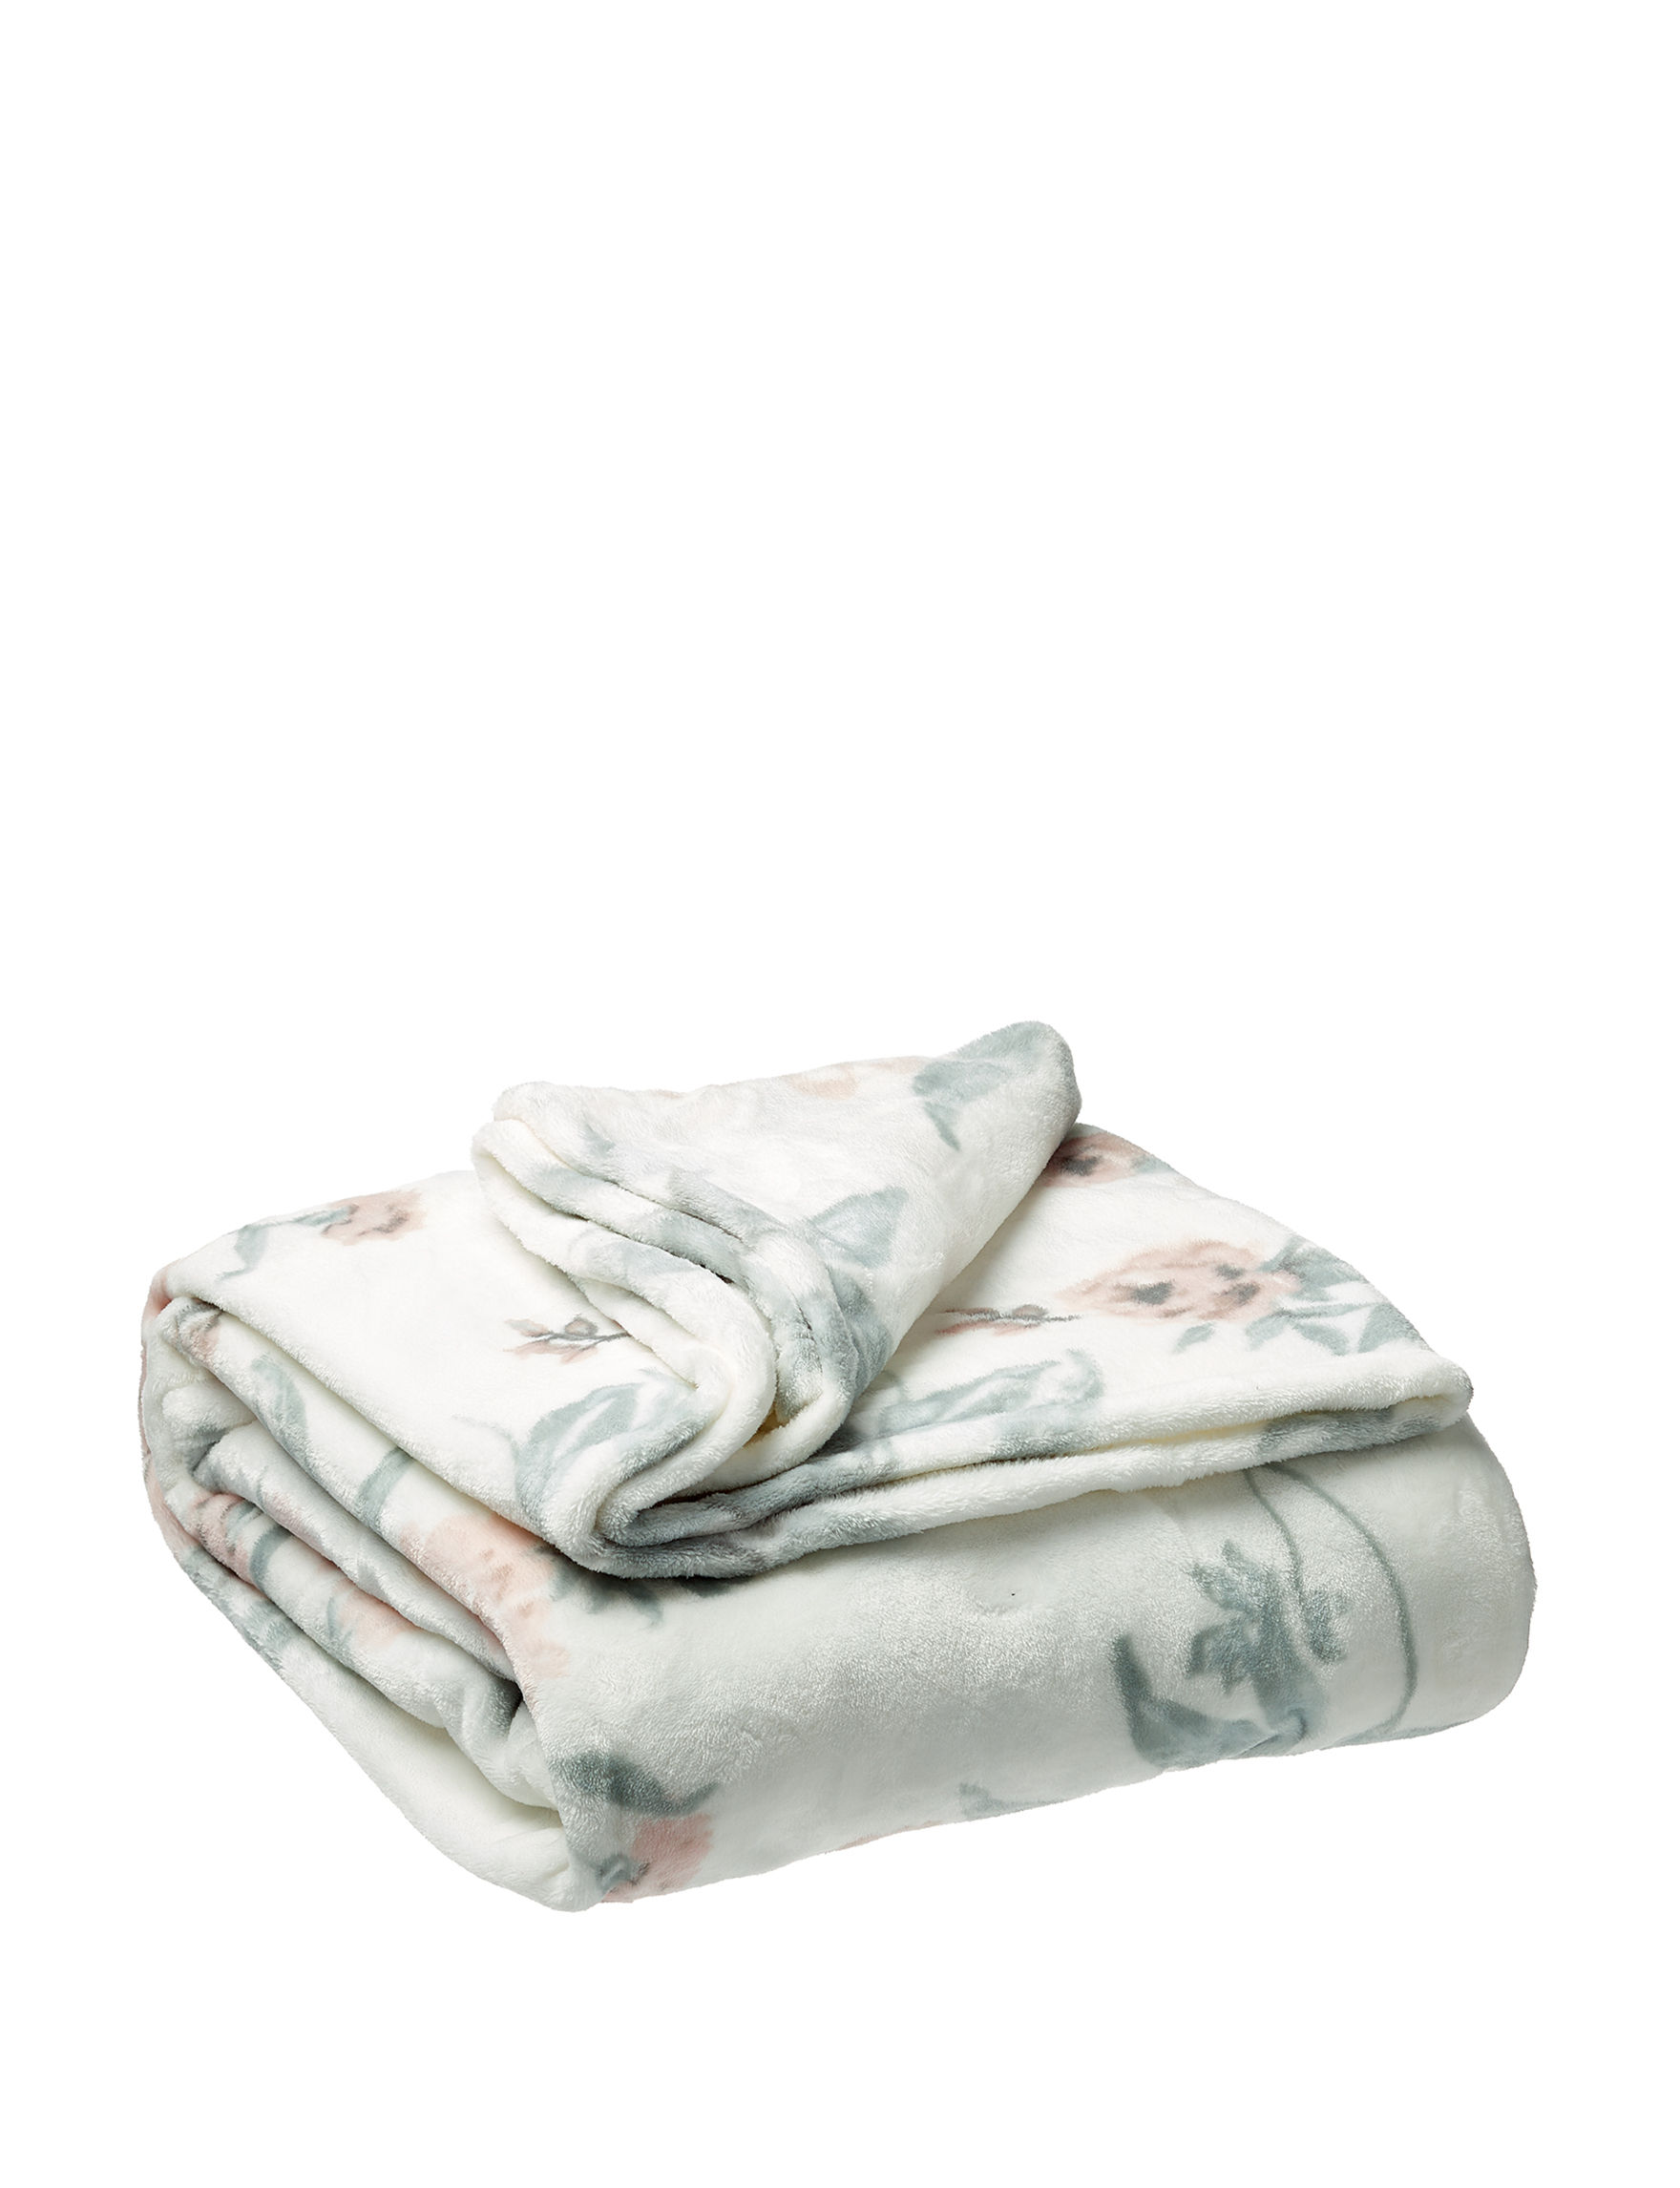 Sage White / Multi Blankets & Throws